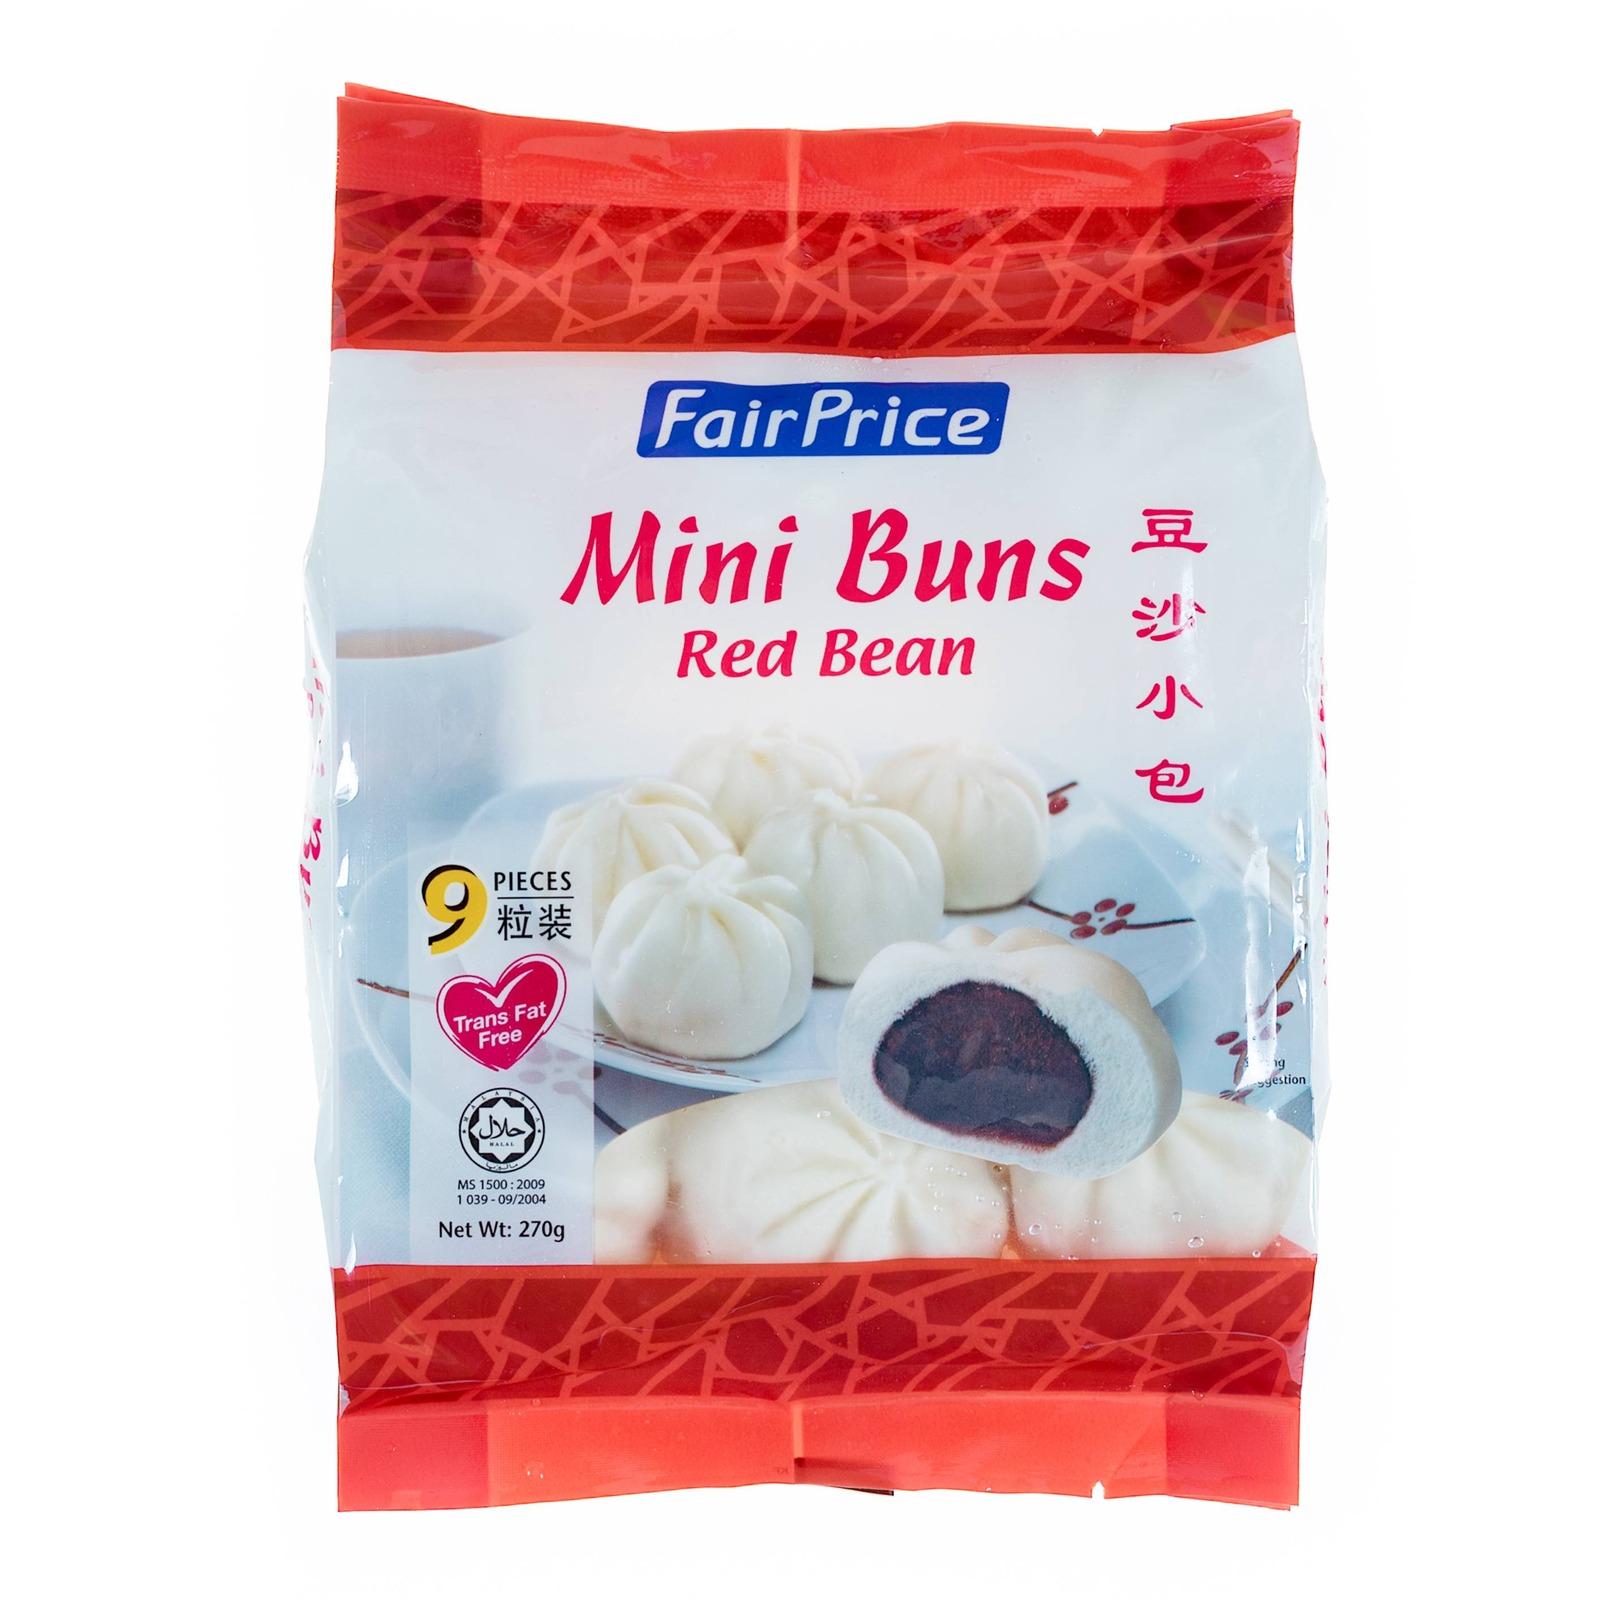 FairPrice Frozen Mini Buns - Red Bean